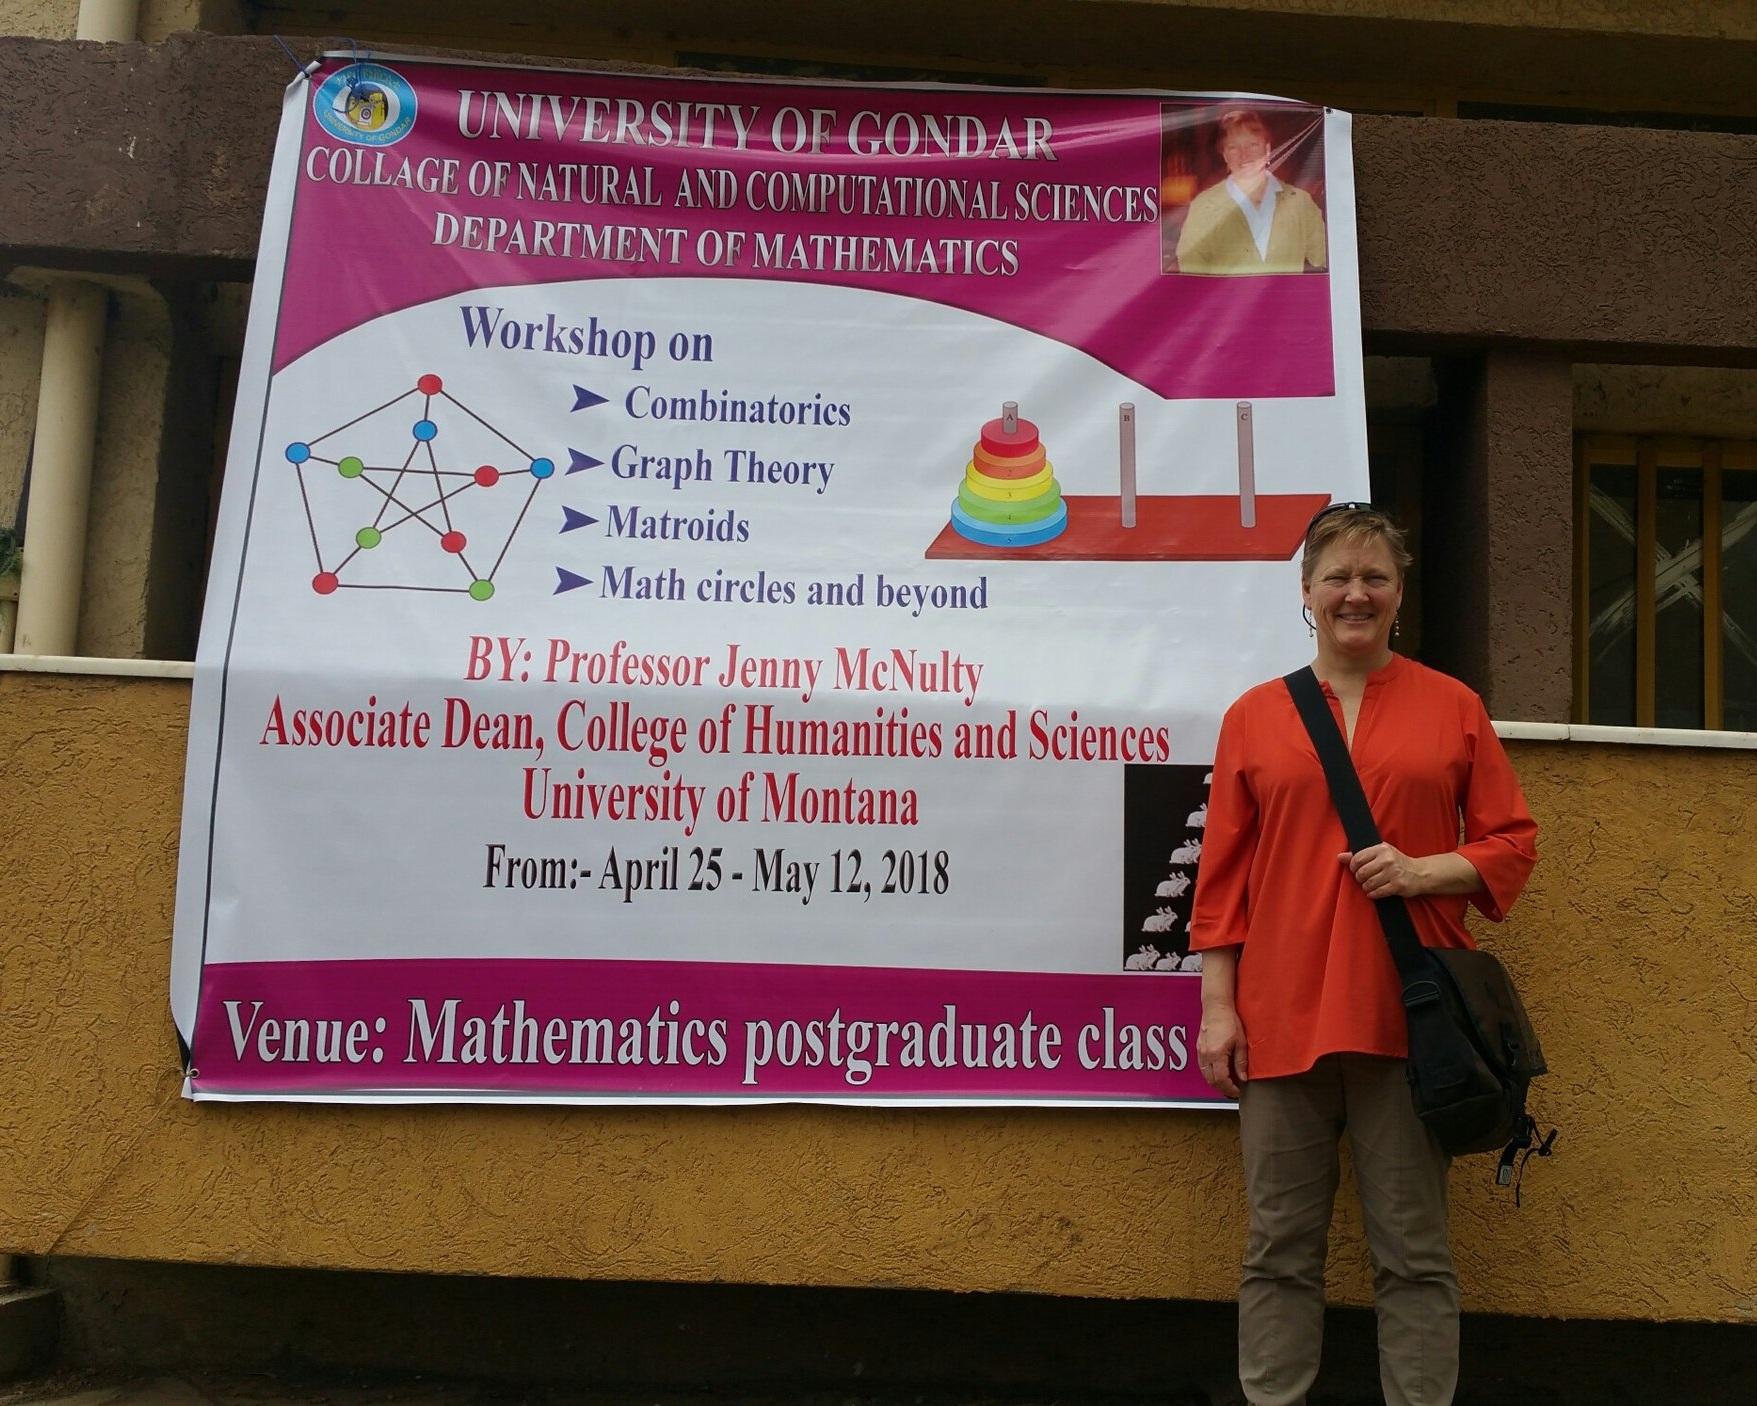 Jenny McNulty: Hosted by the University of Gondar, Ethiopia